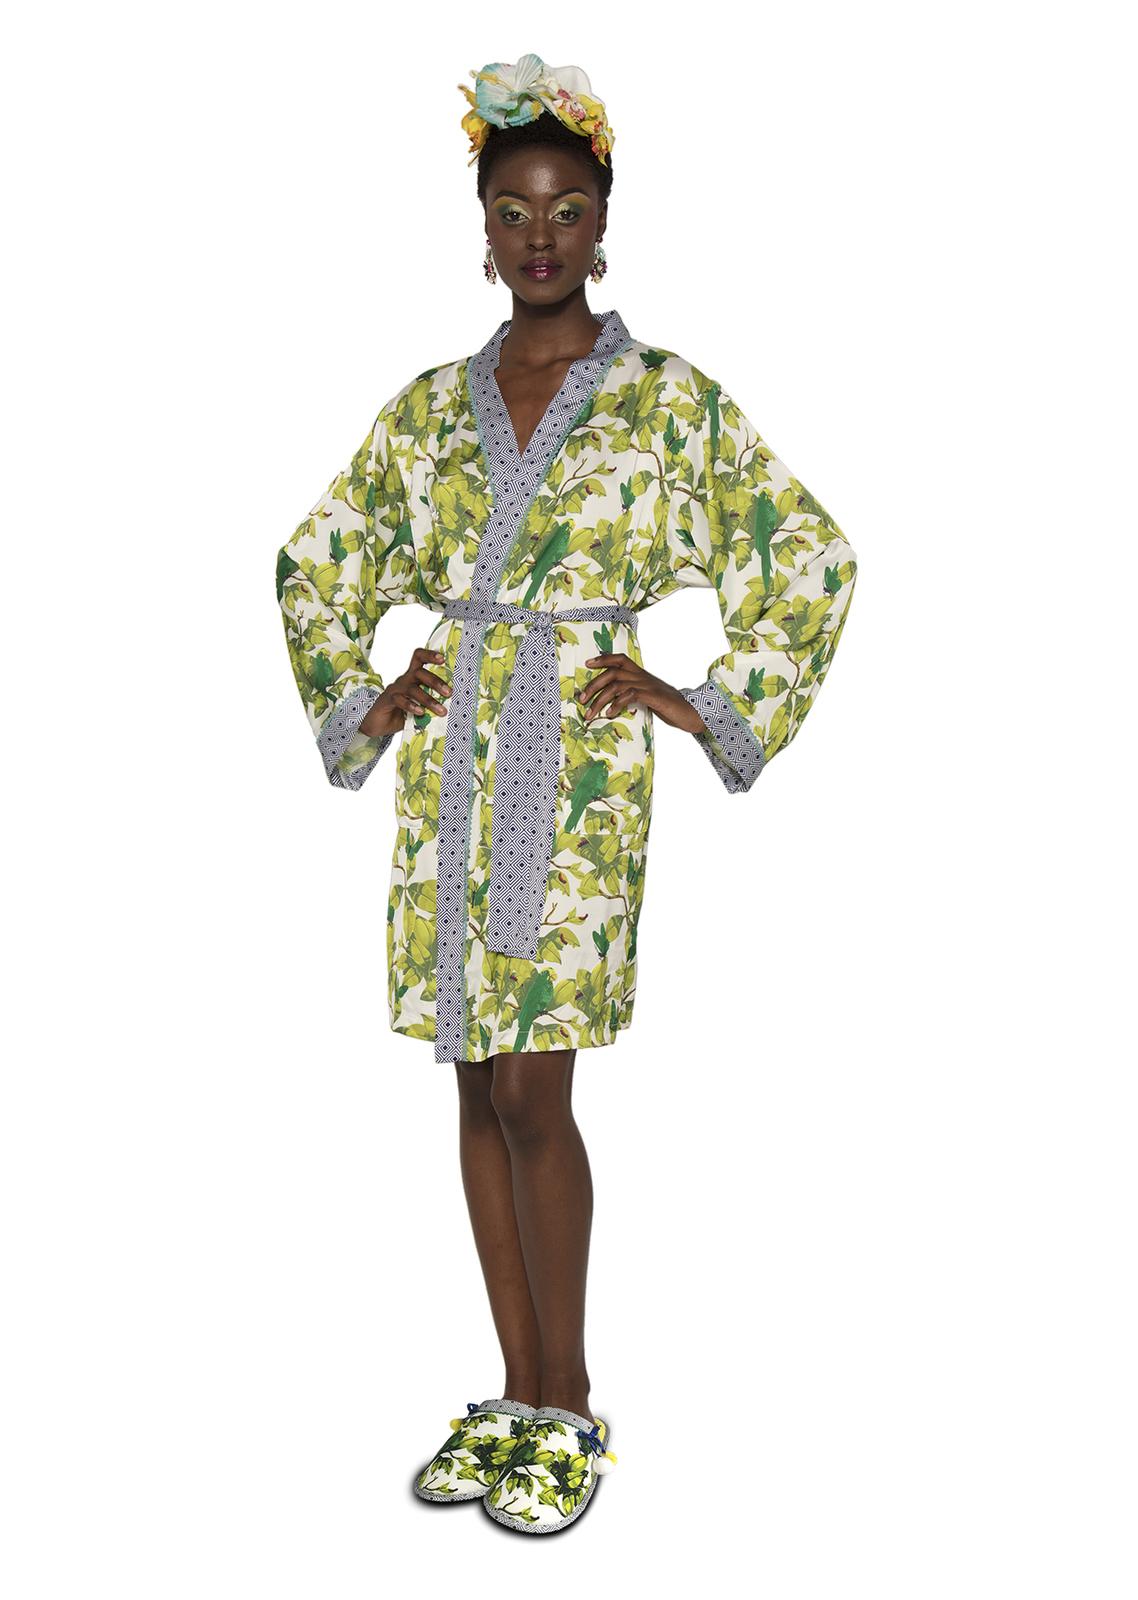 Frida Kahlo: Bonito Hoodless Satin Bathrobe - Green & White Ladies (One Size) image